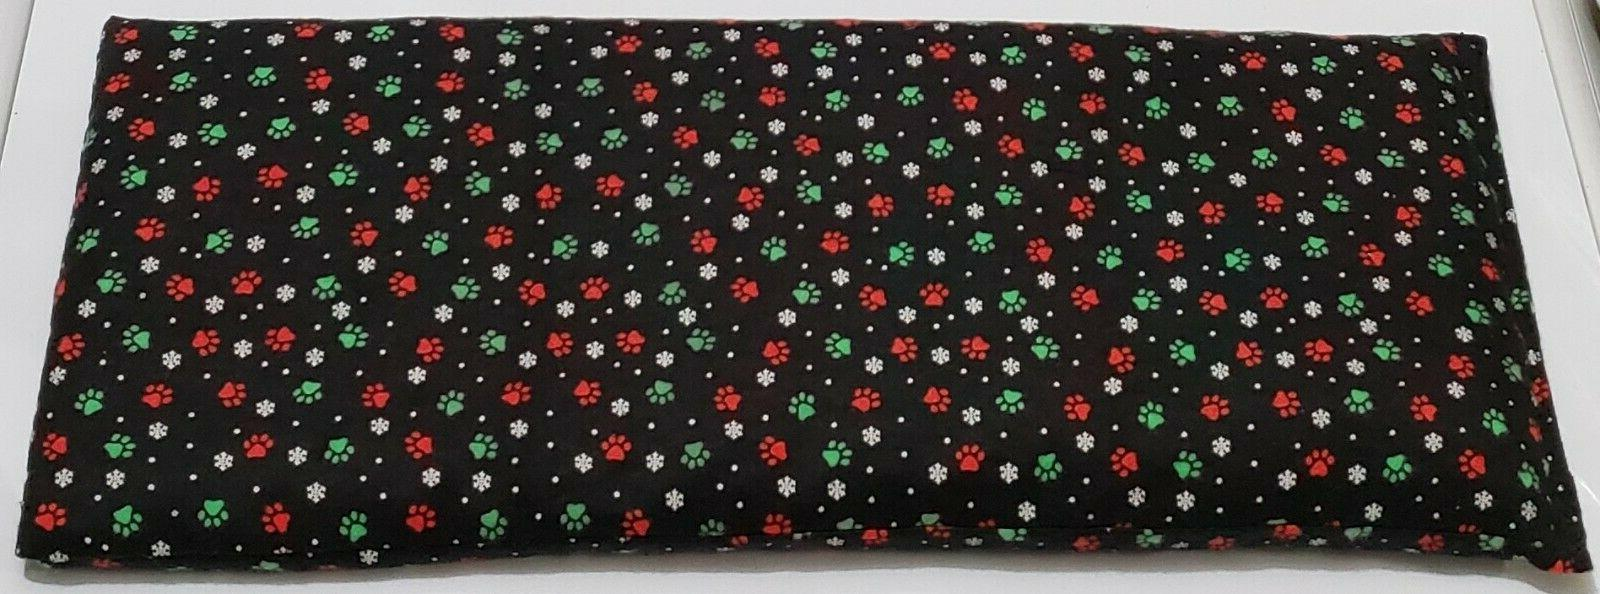 Cherry Pad,